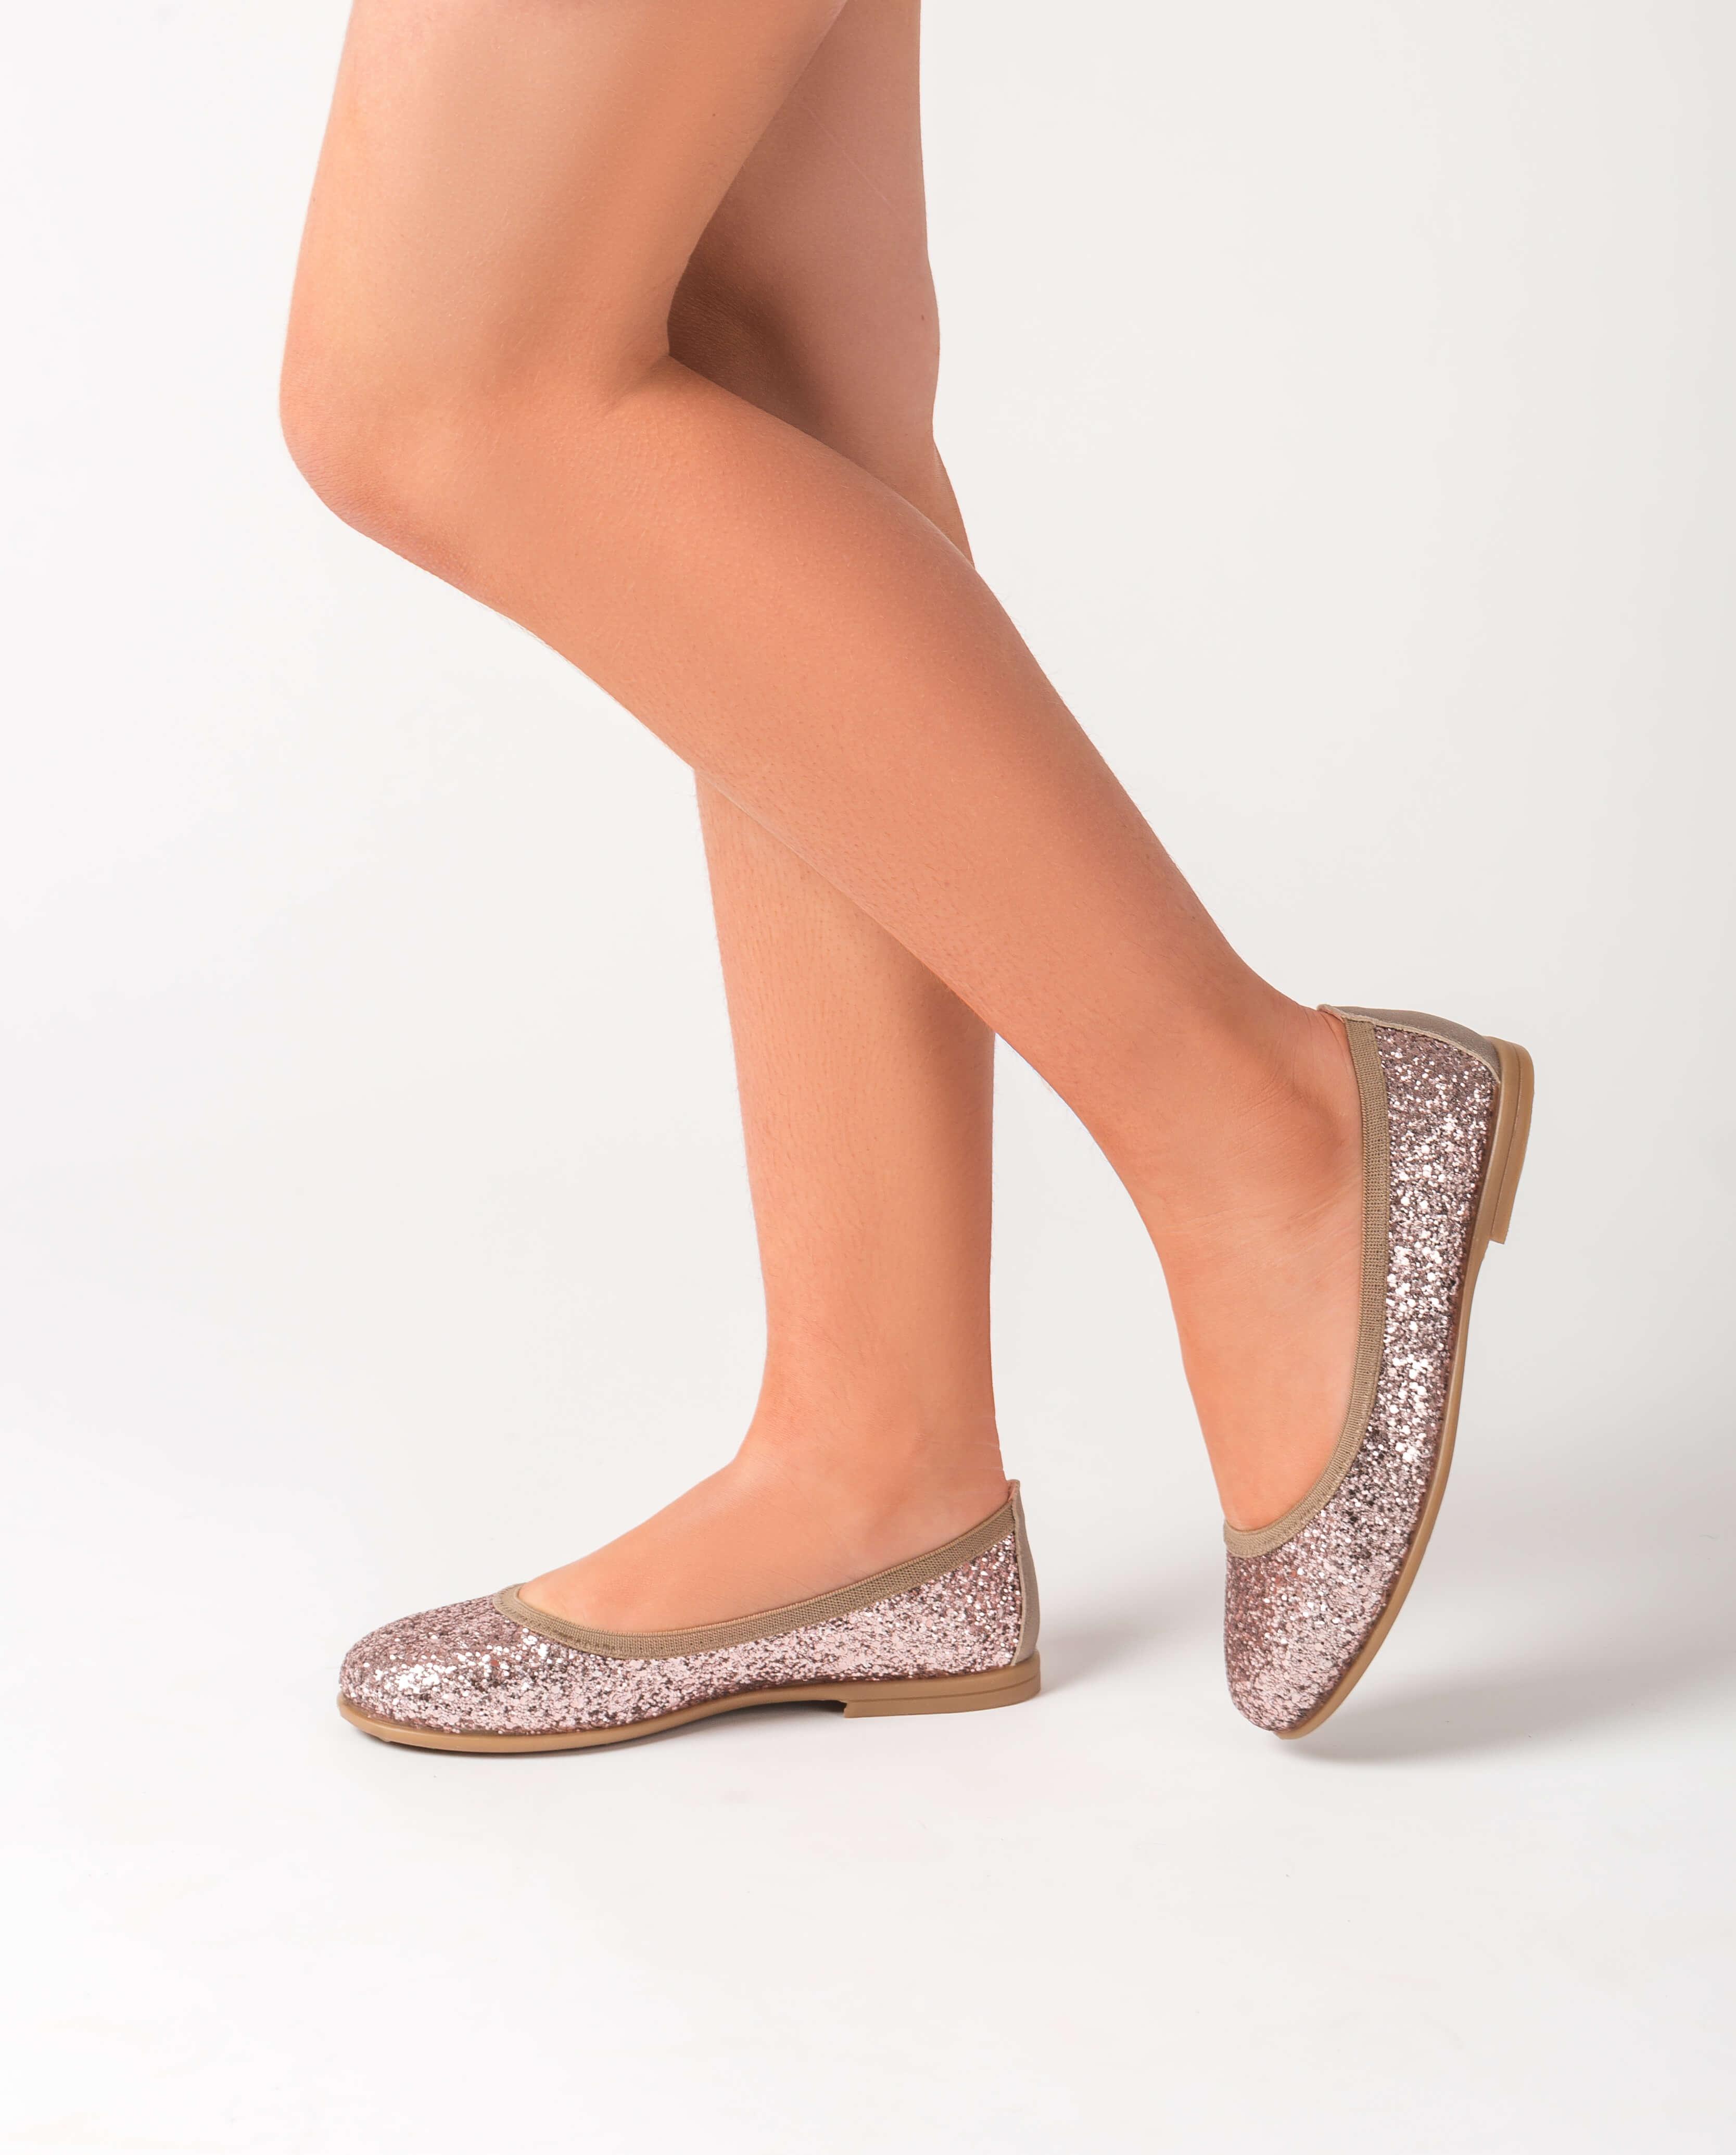 UNISA Glitzer-Ballerinas SABRINA_20_GL mumm 5